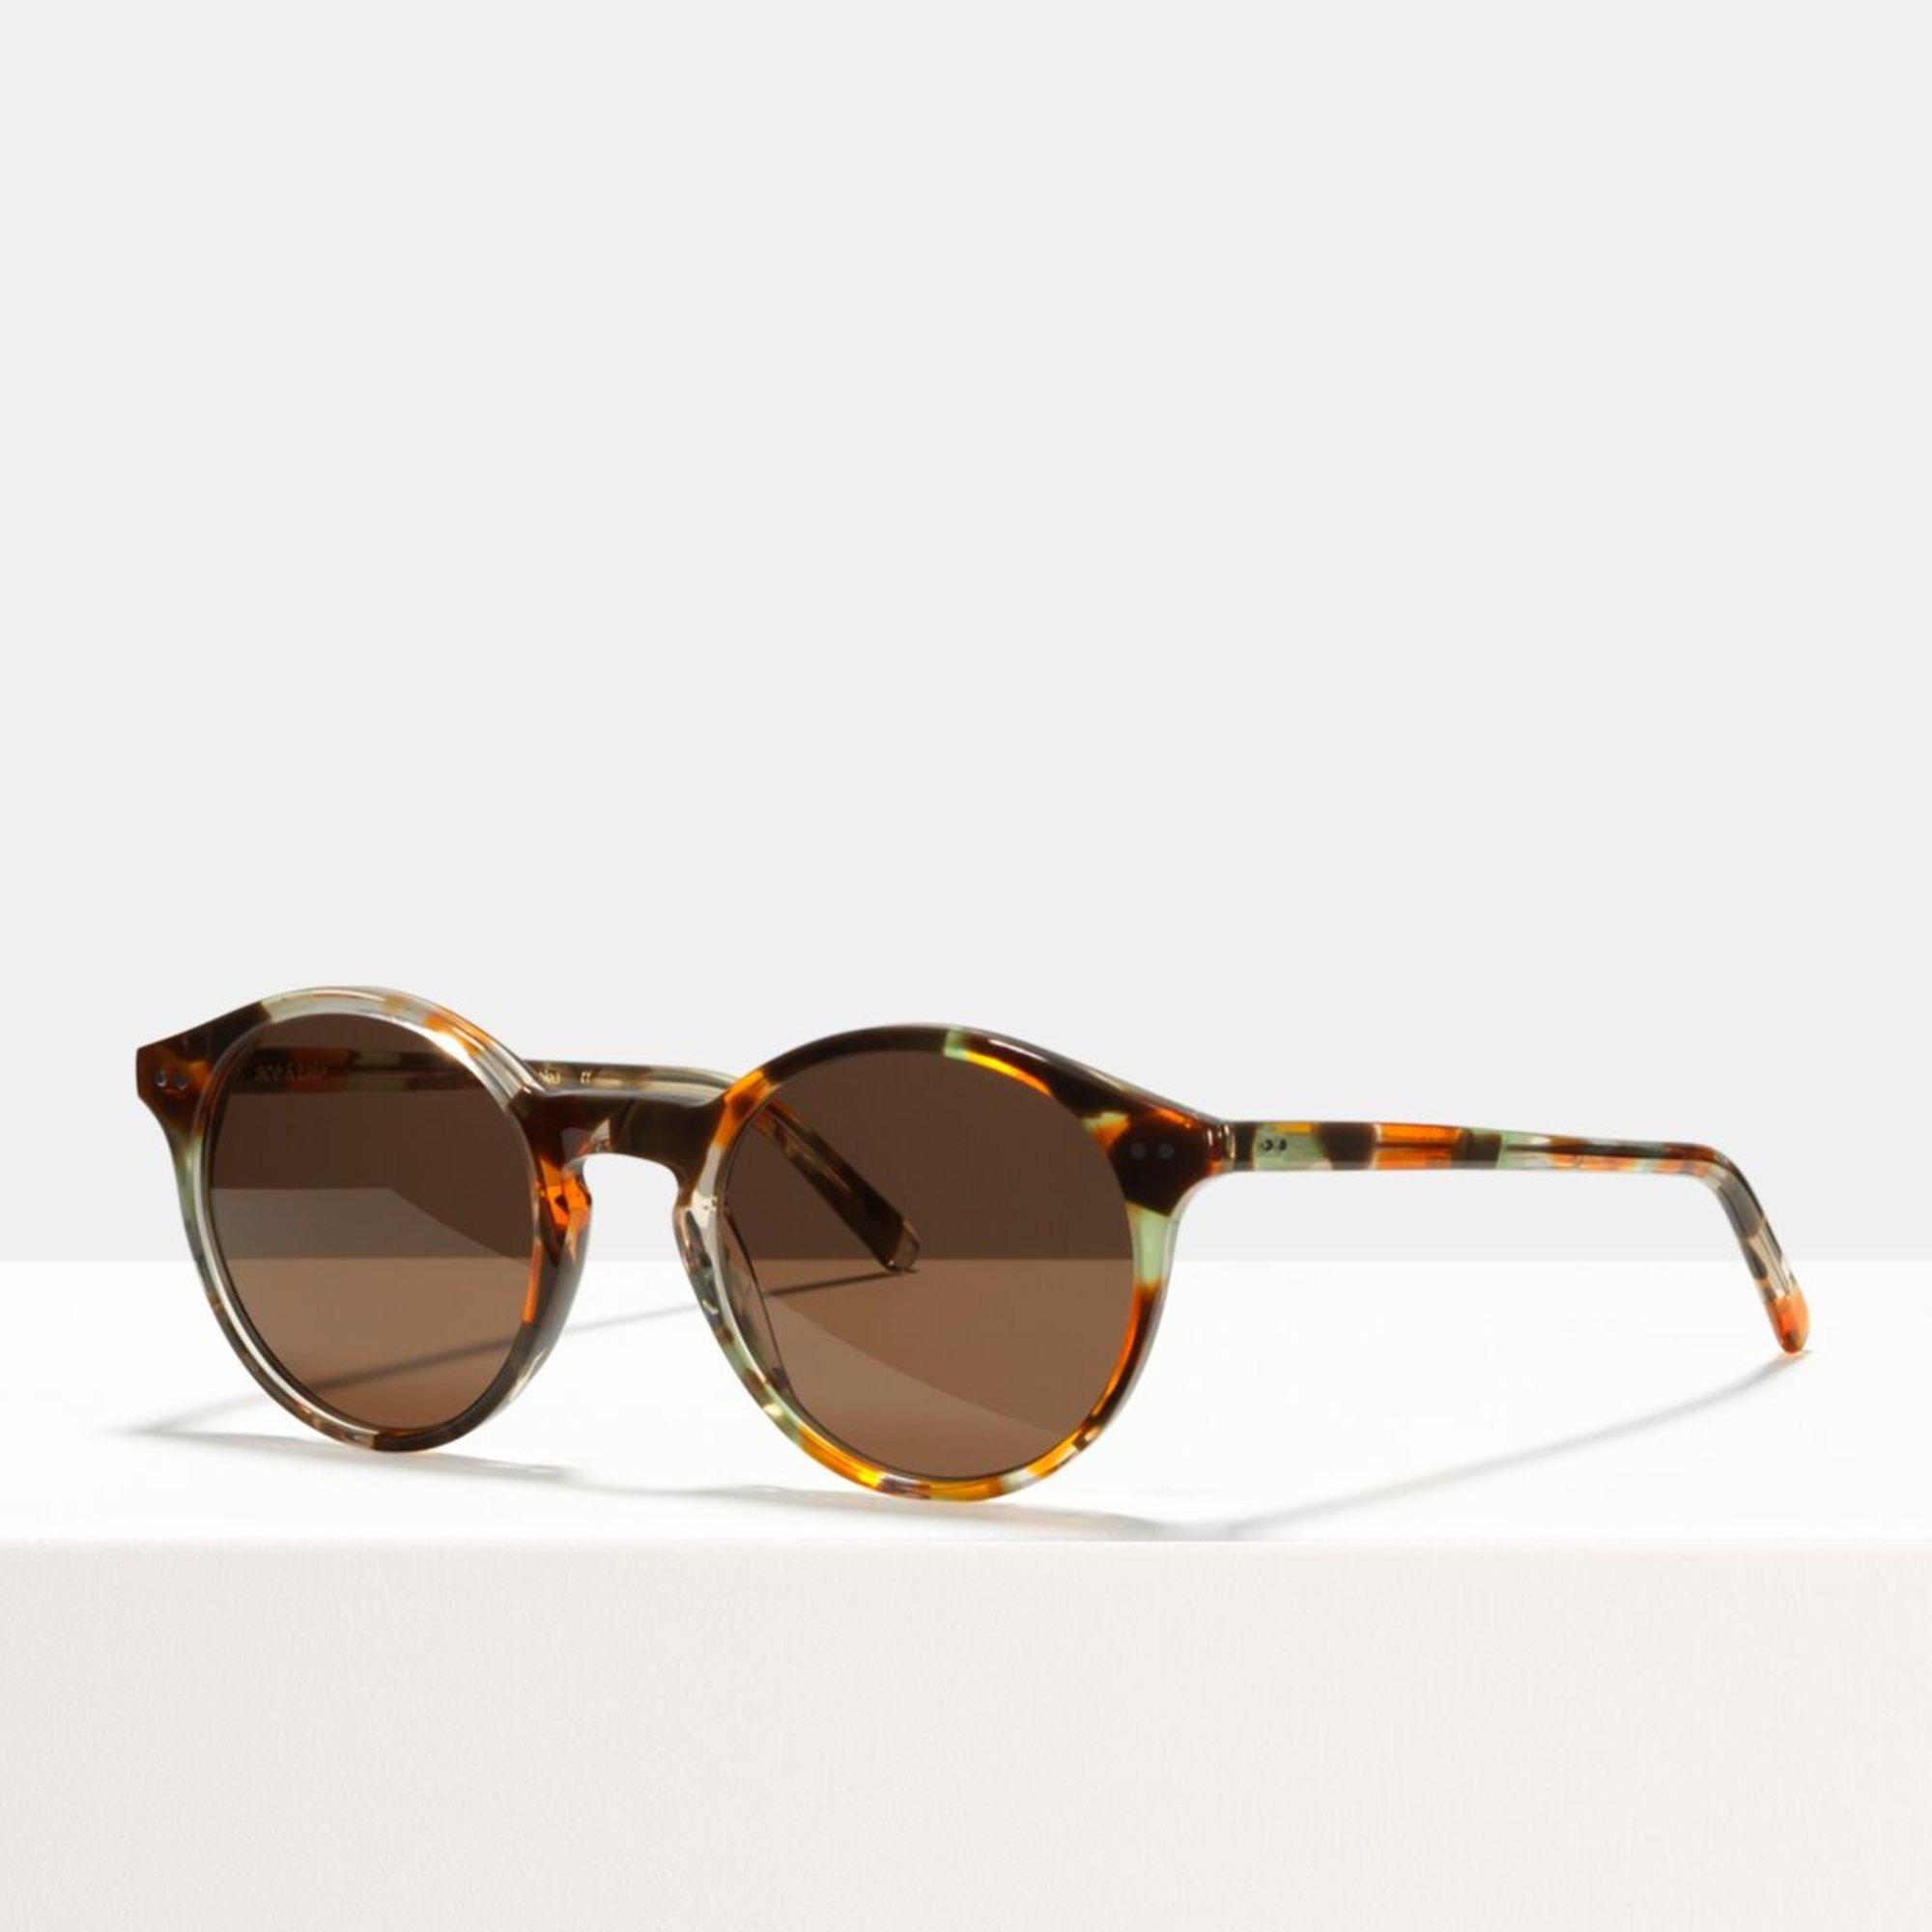 Ace & Tate Sunglasses | round acetate in Brown, Green, Orange